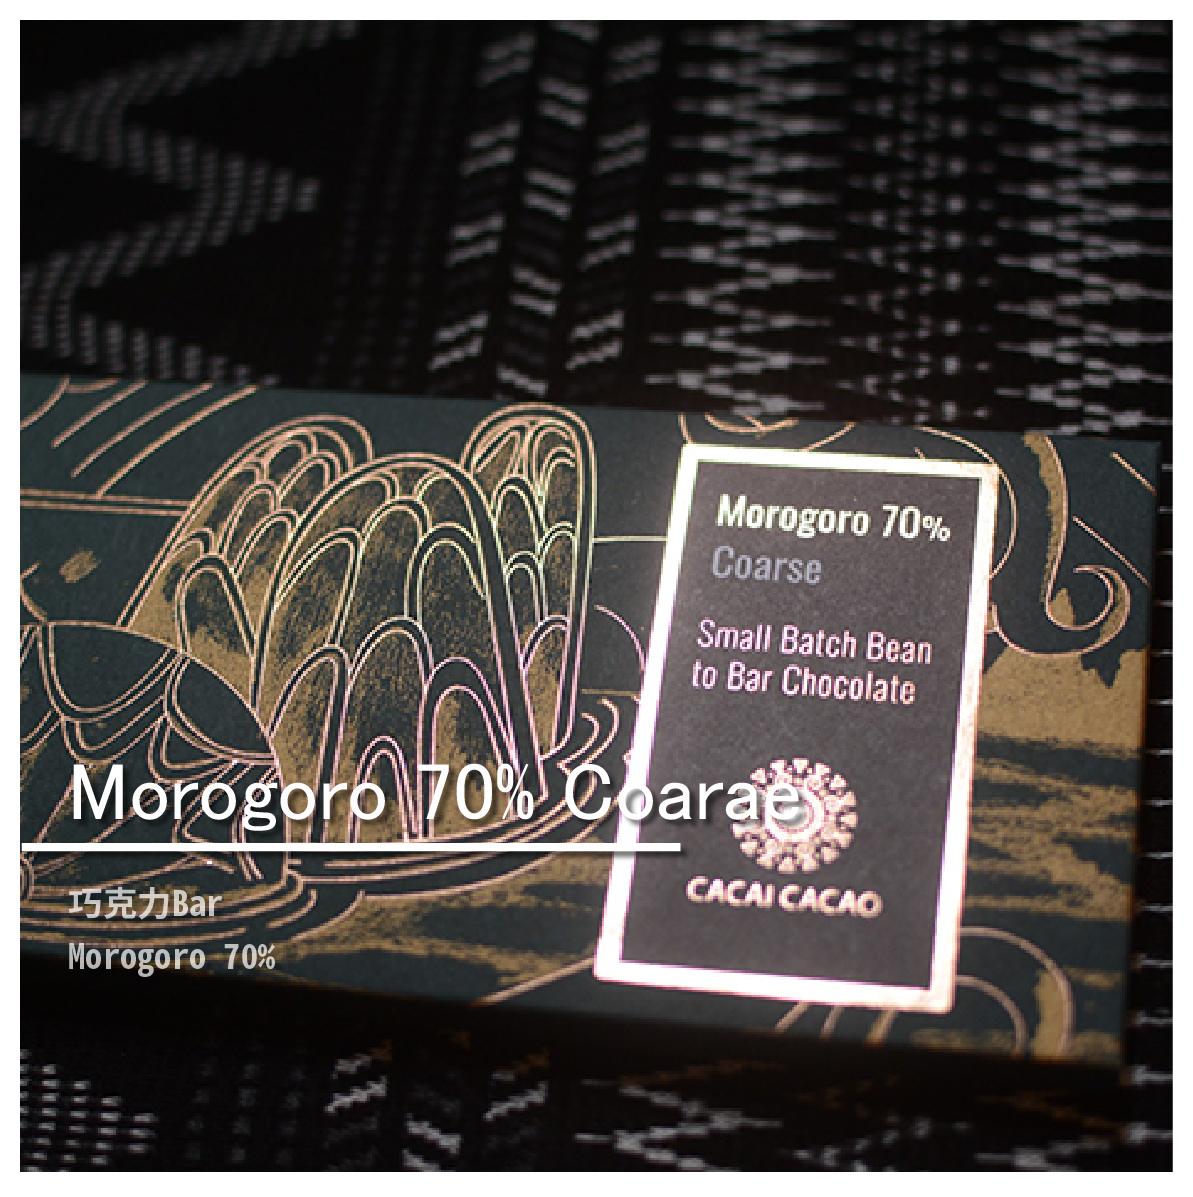 【CACAI CACAO】巧克力Bar-Morogoro 70% Coarse